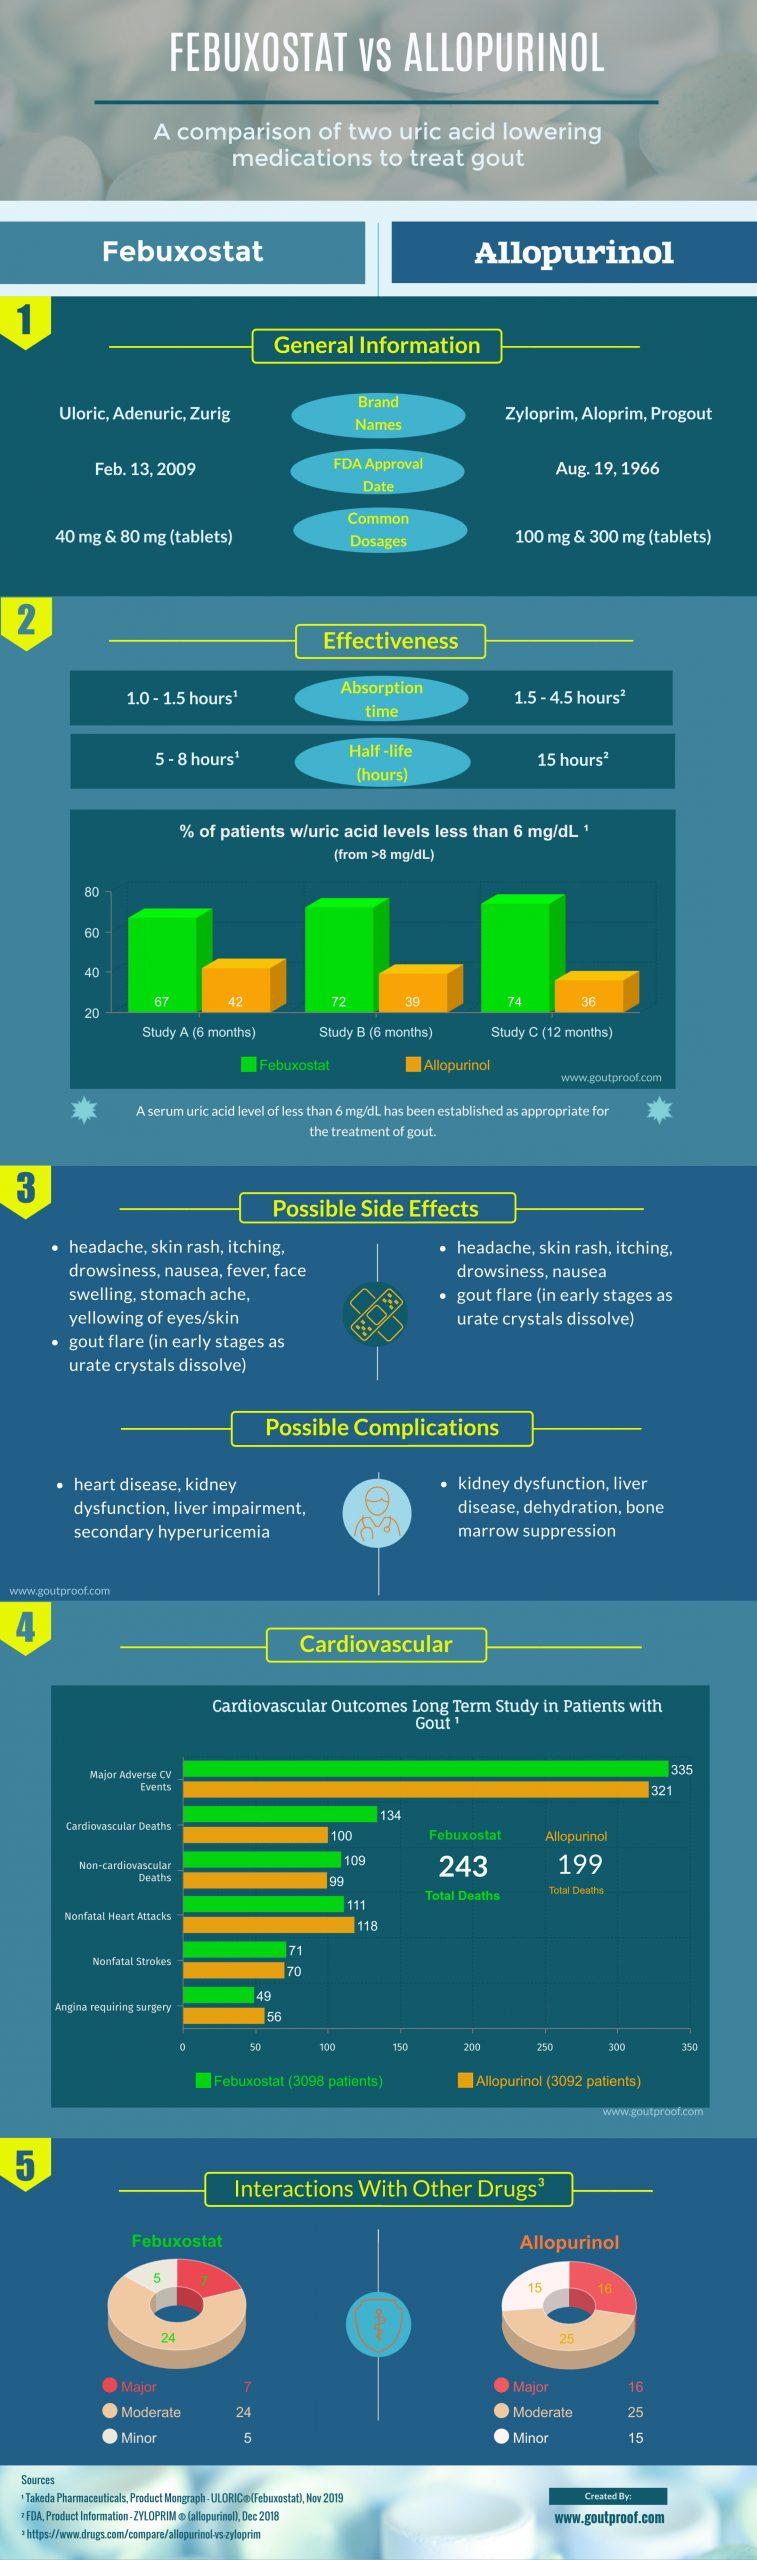 febuxostat vs allopurinol infographic uloric zyloprim podagra